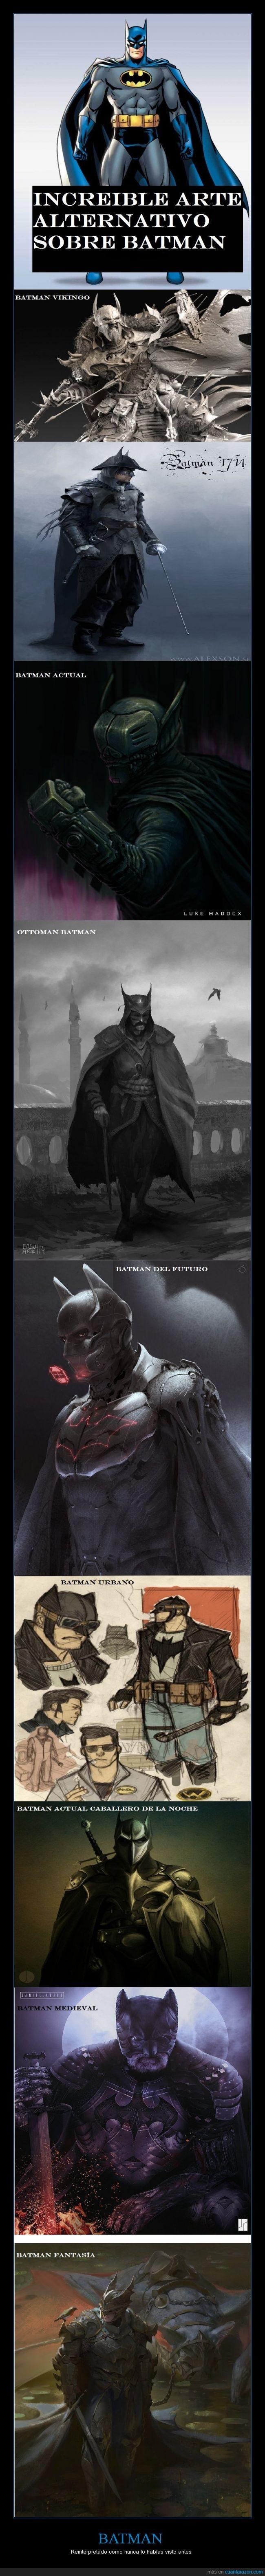 arte,Batman,dc cómics,dibujo,propuestas,superheroe